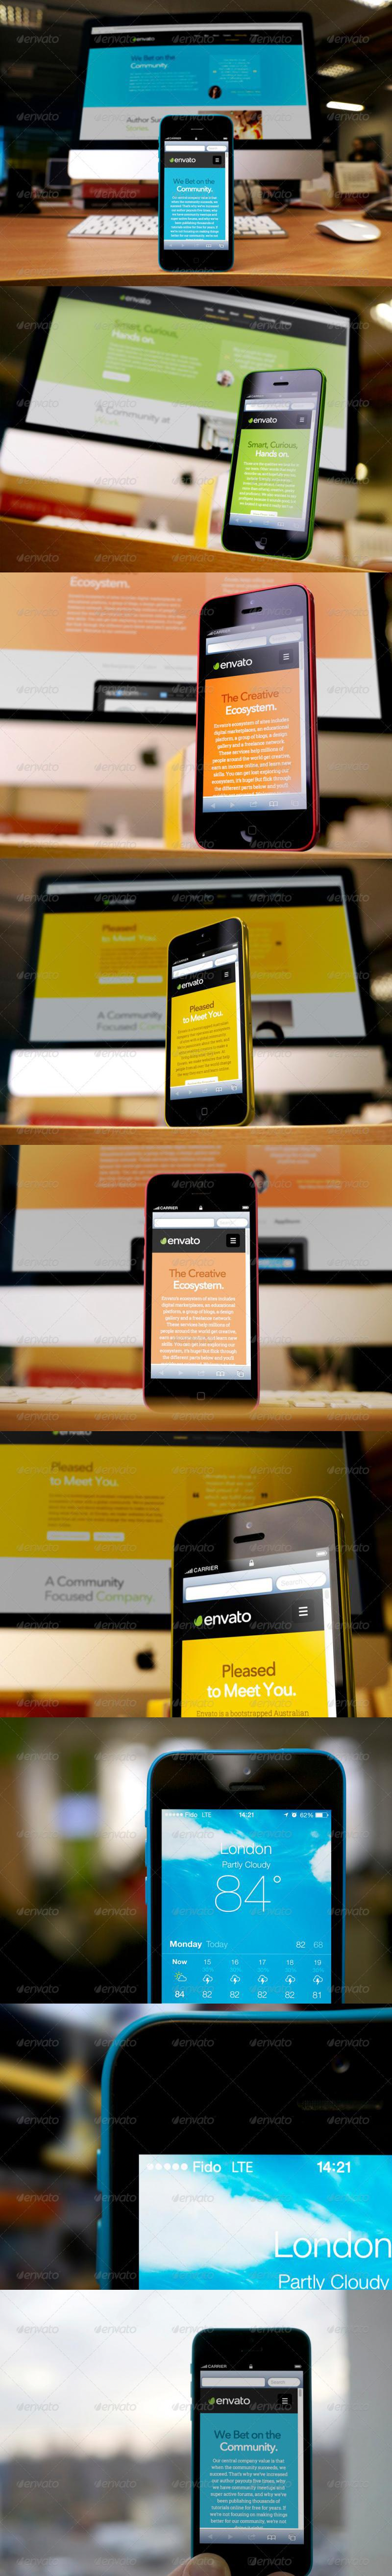 Responsive Devices Phone 5C Desktop Mock-Up